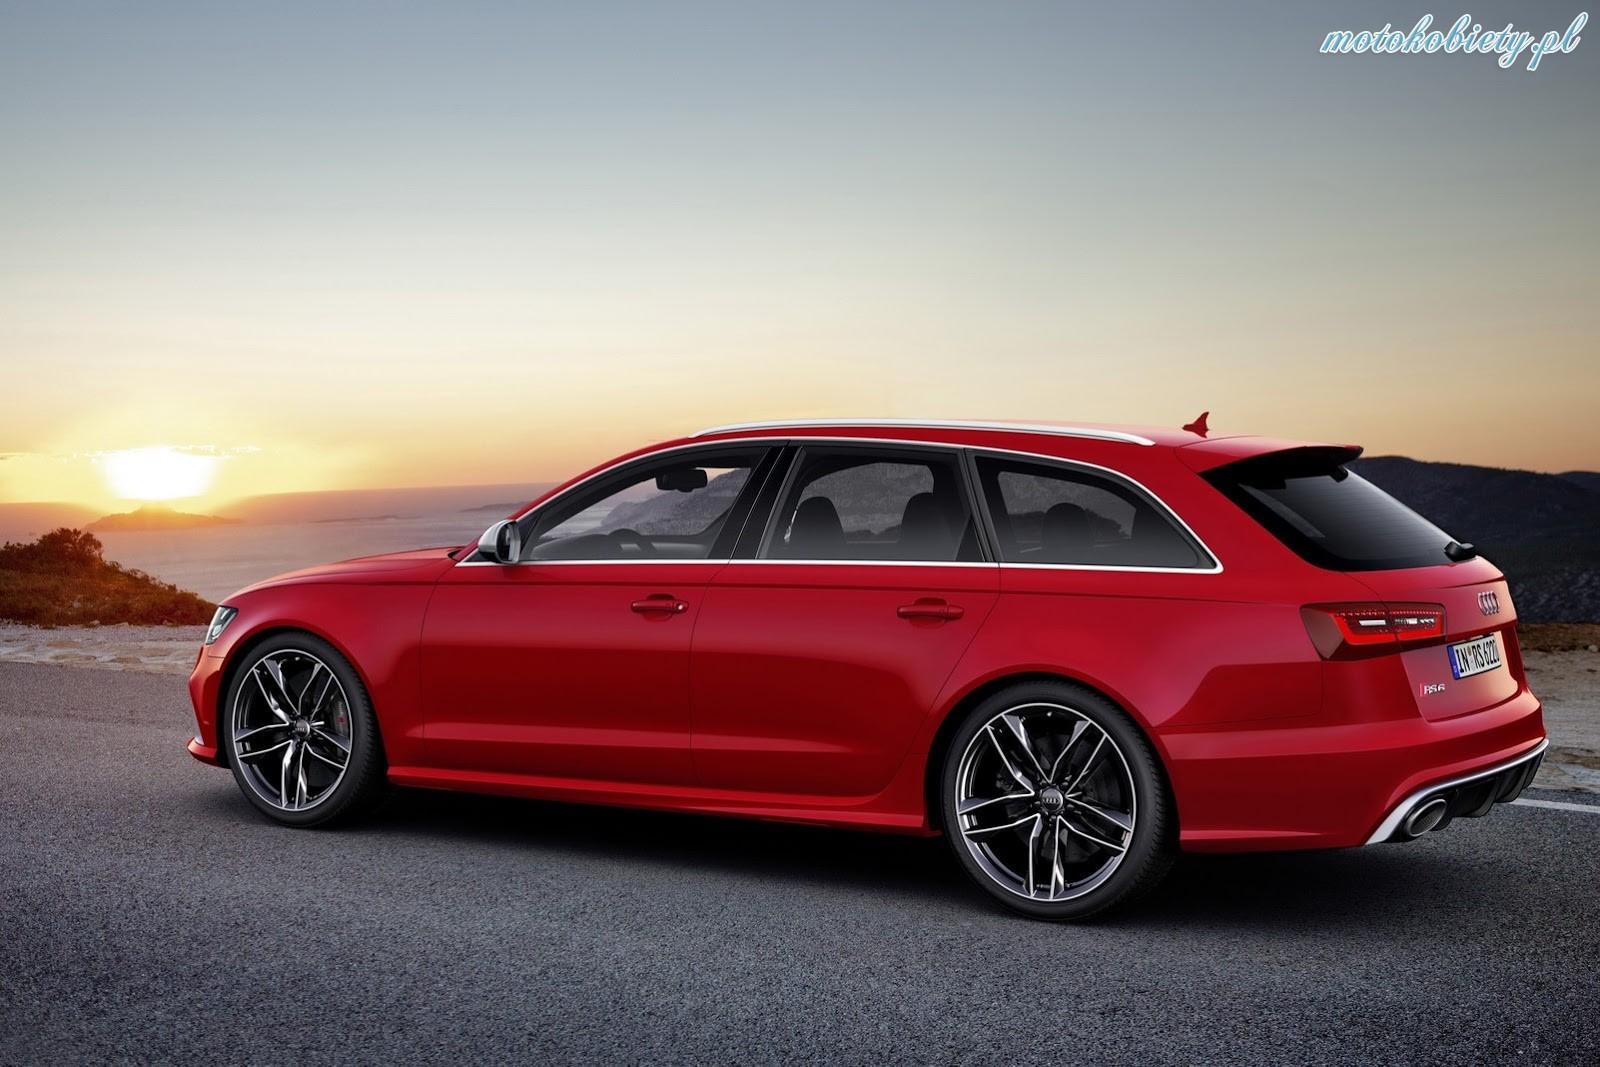 2014 Audi Rs6 Avant 3